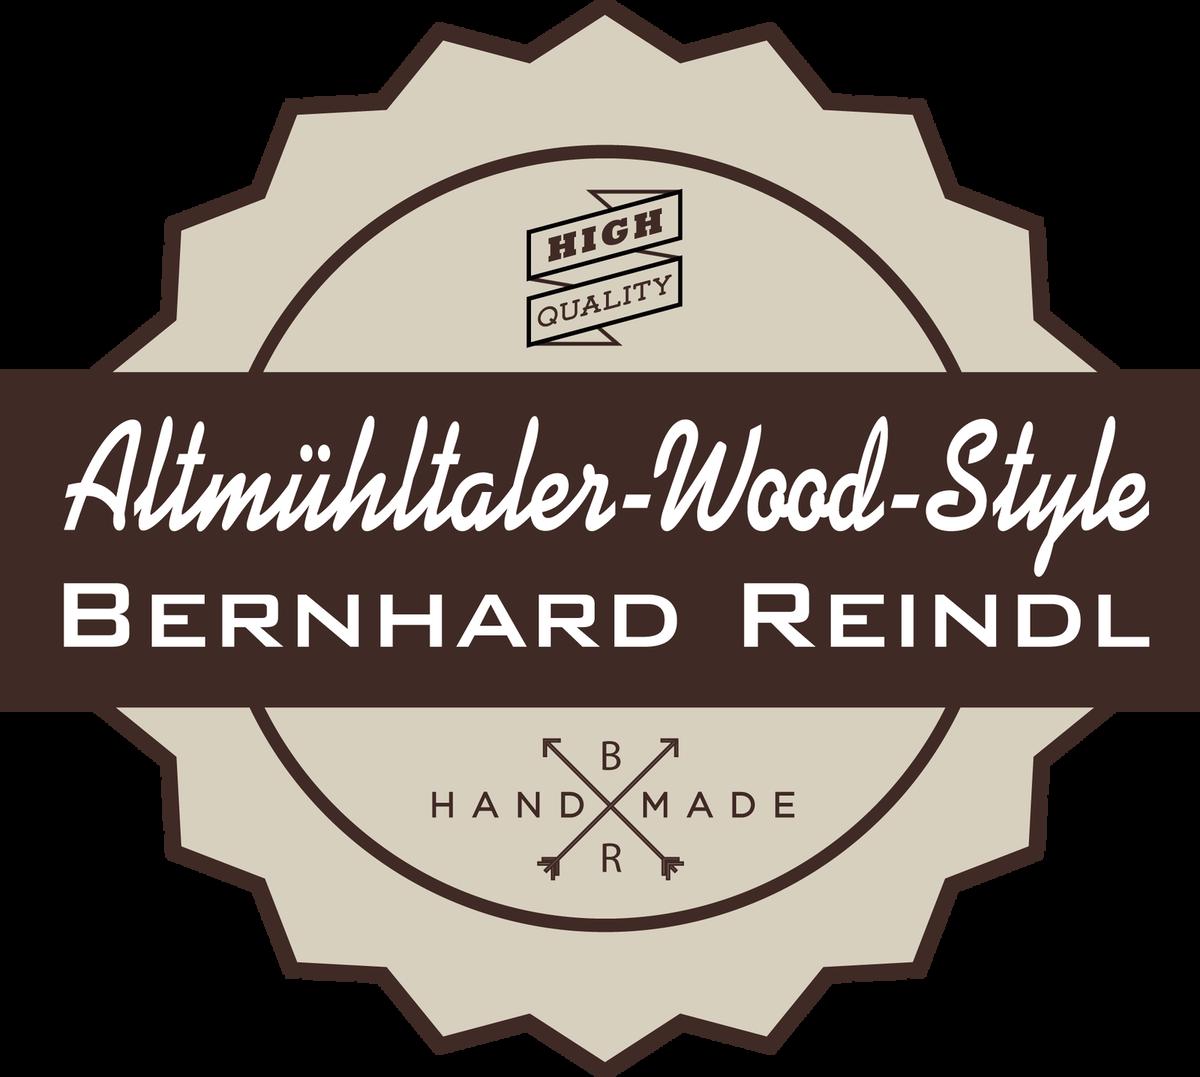 Altmühltaler-Wood-Style